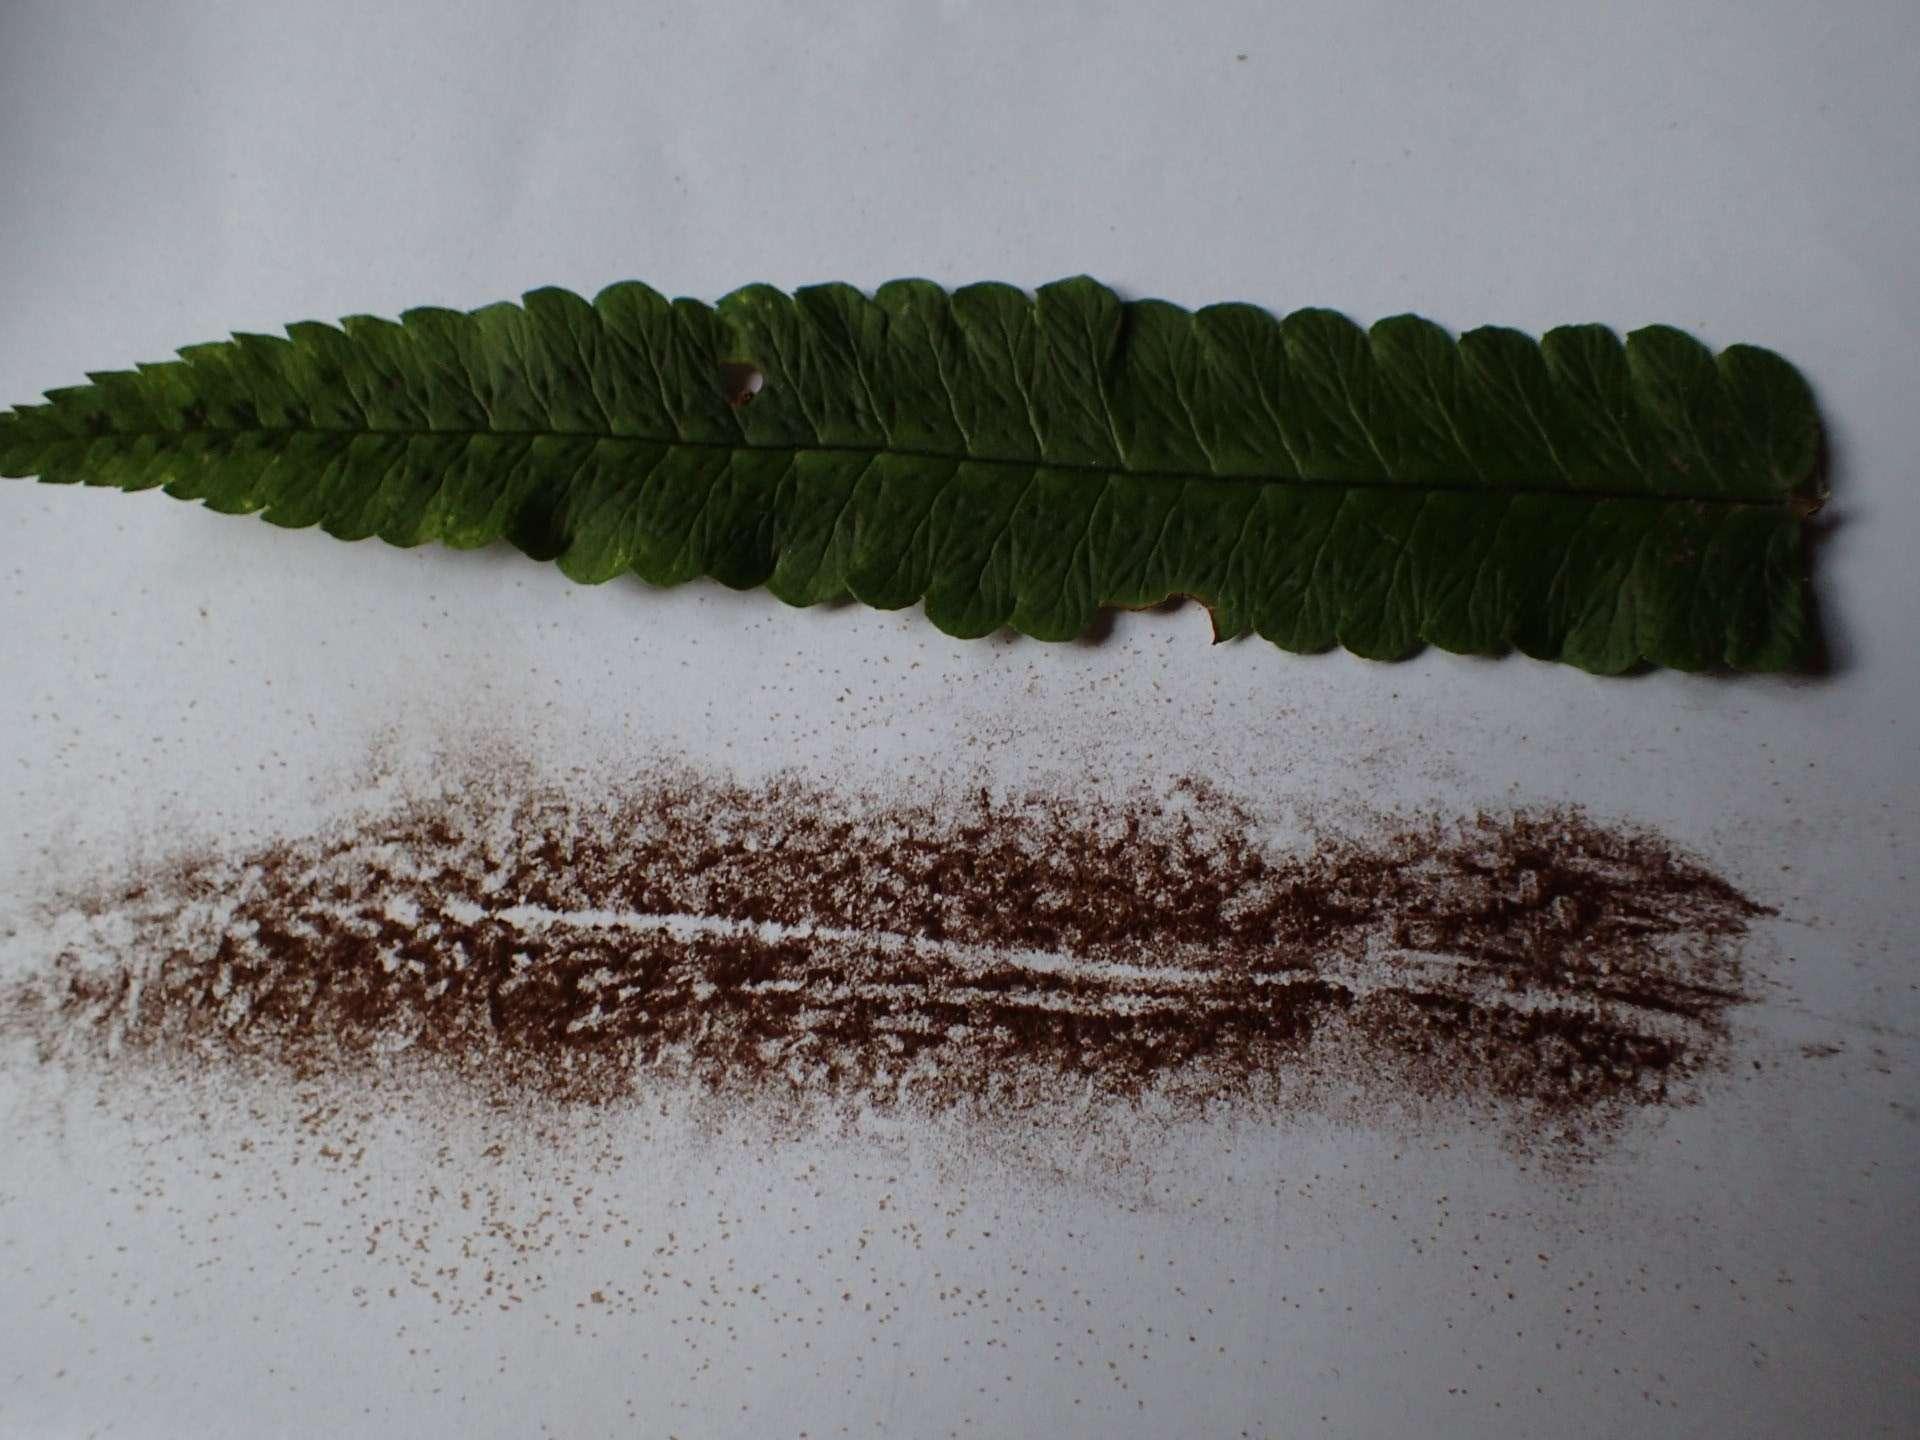 la collecte des spores